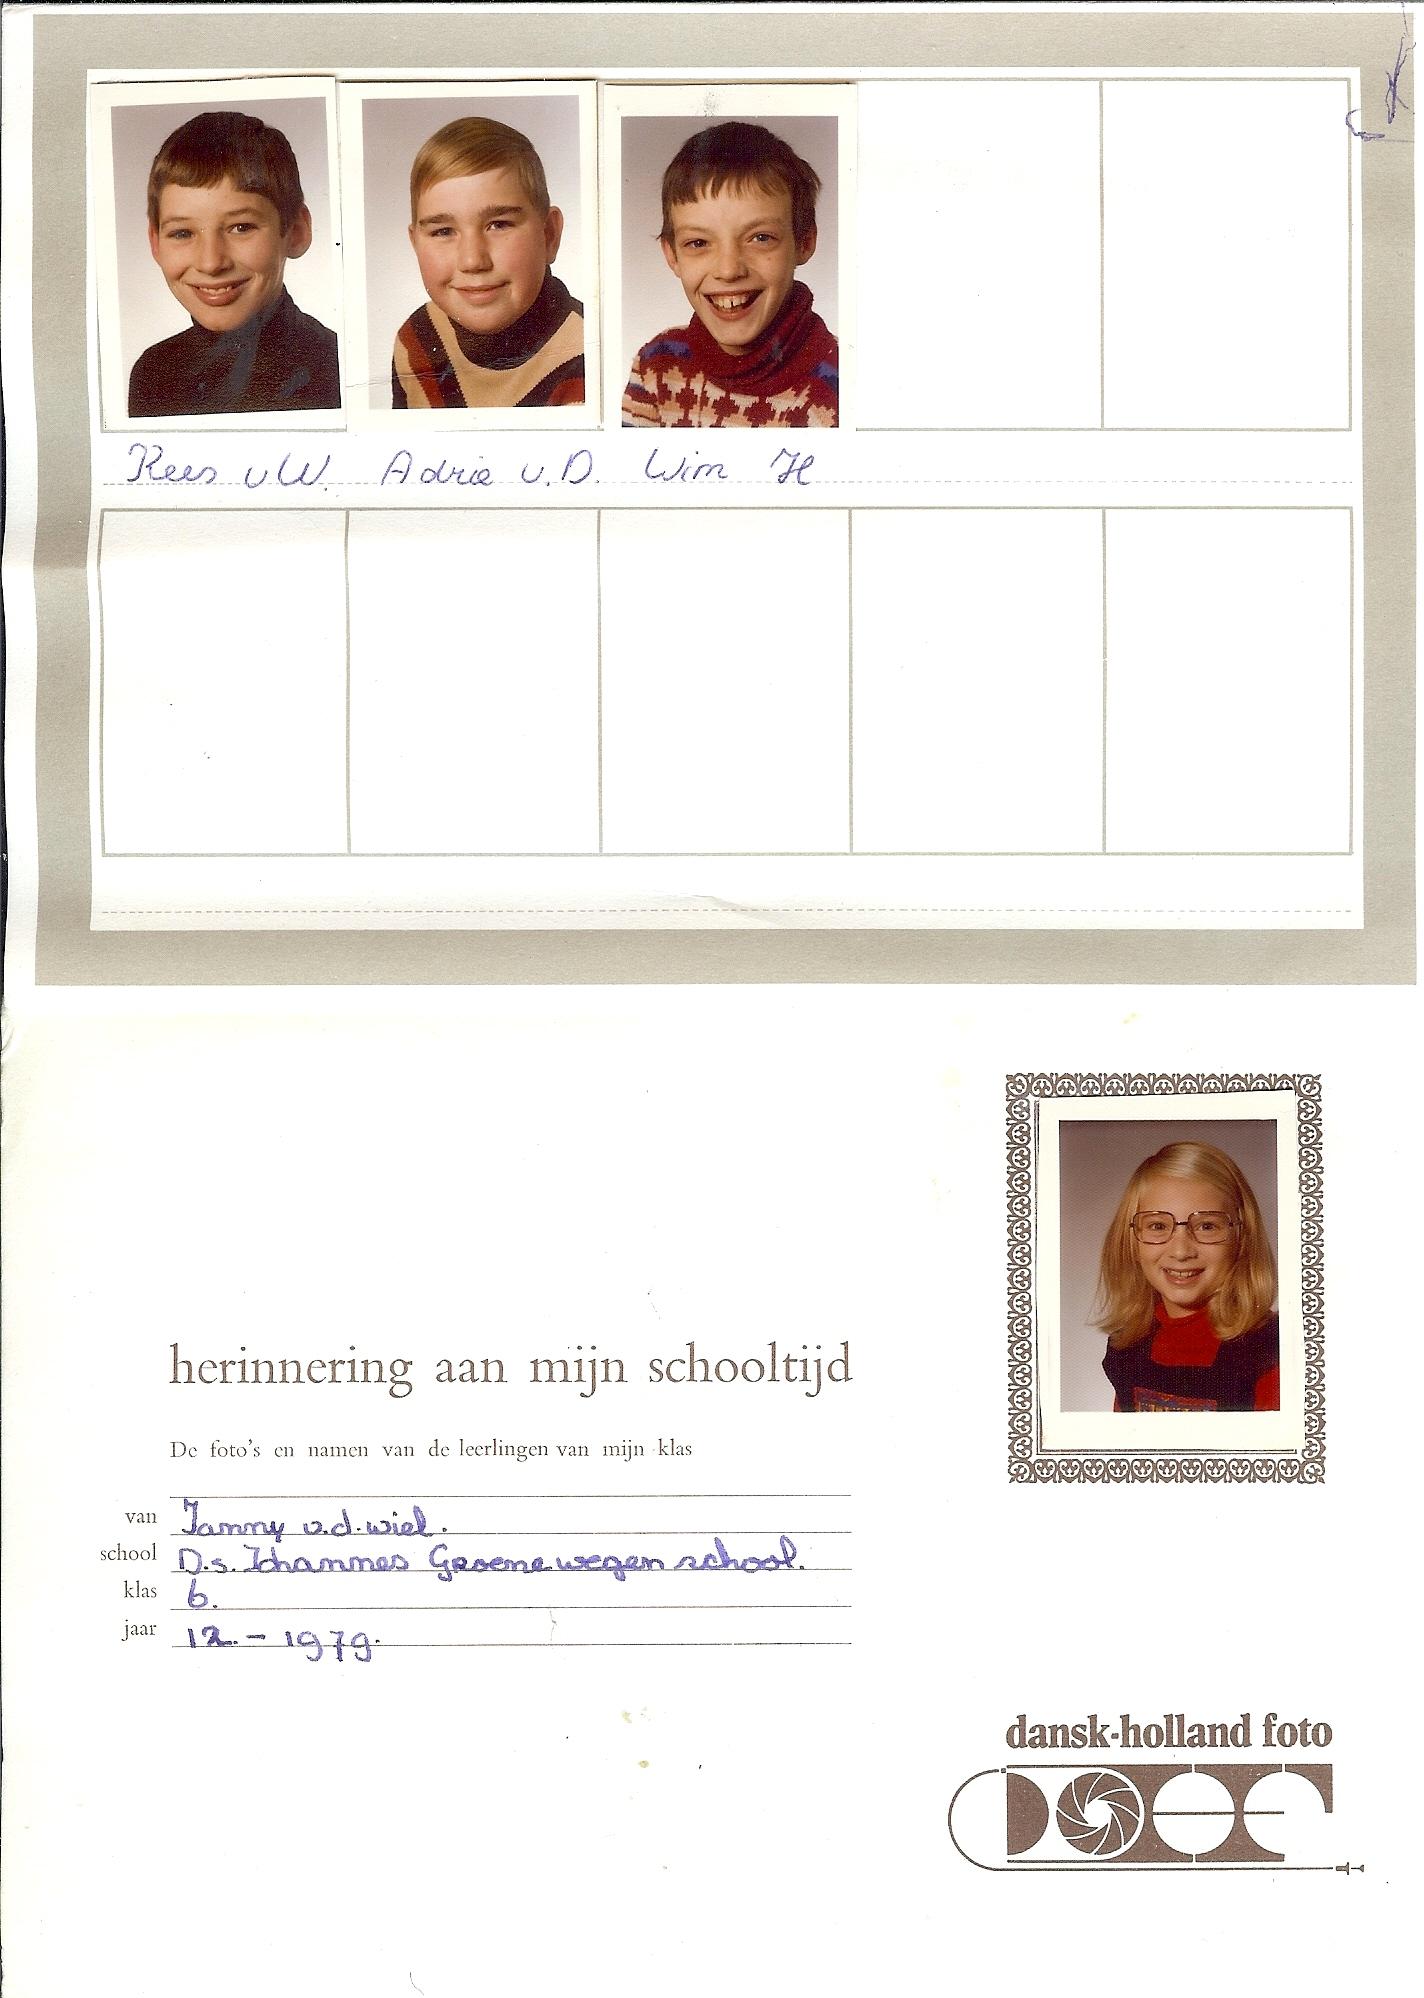 Ds Johannes Groenewegenschool foto